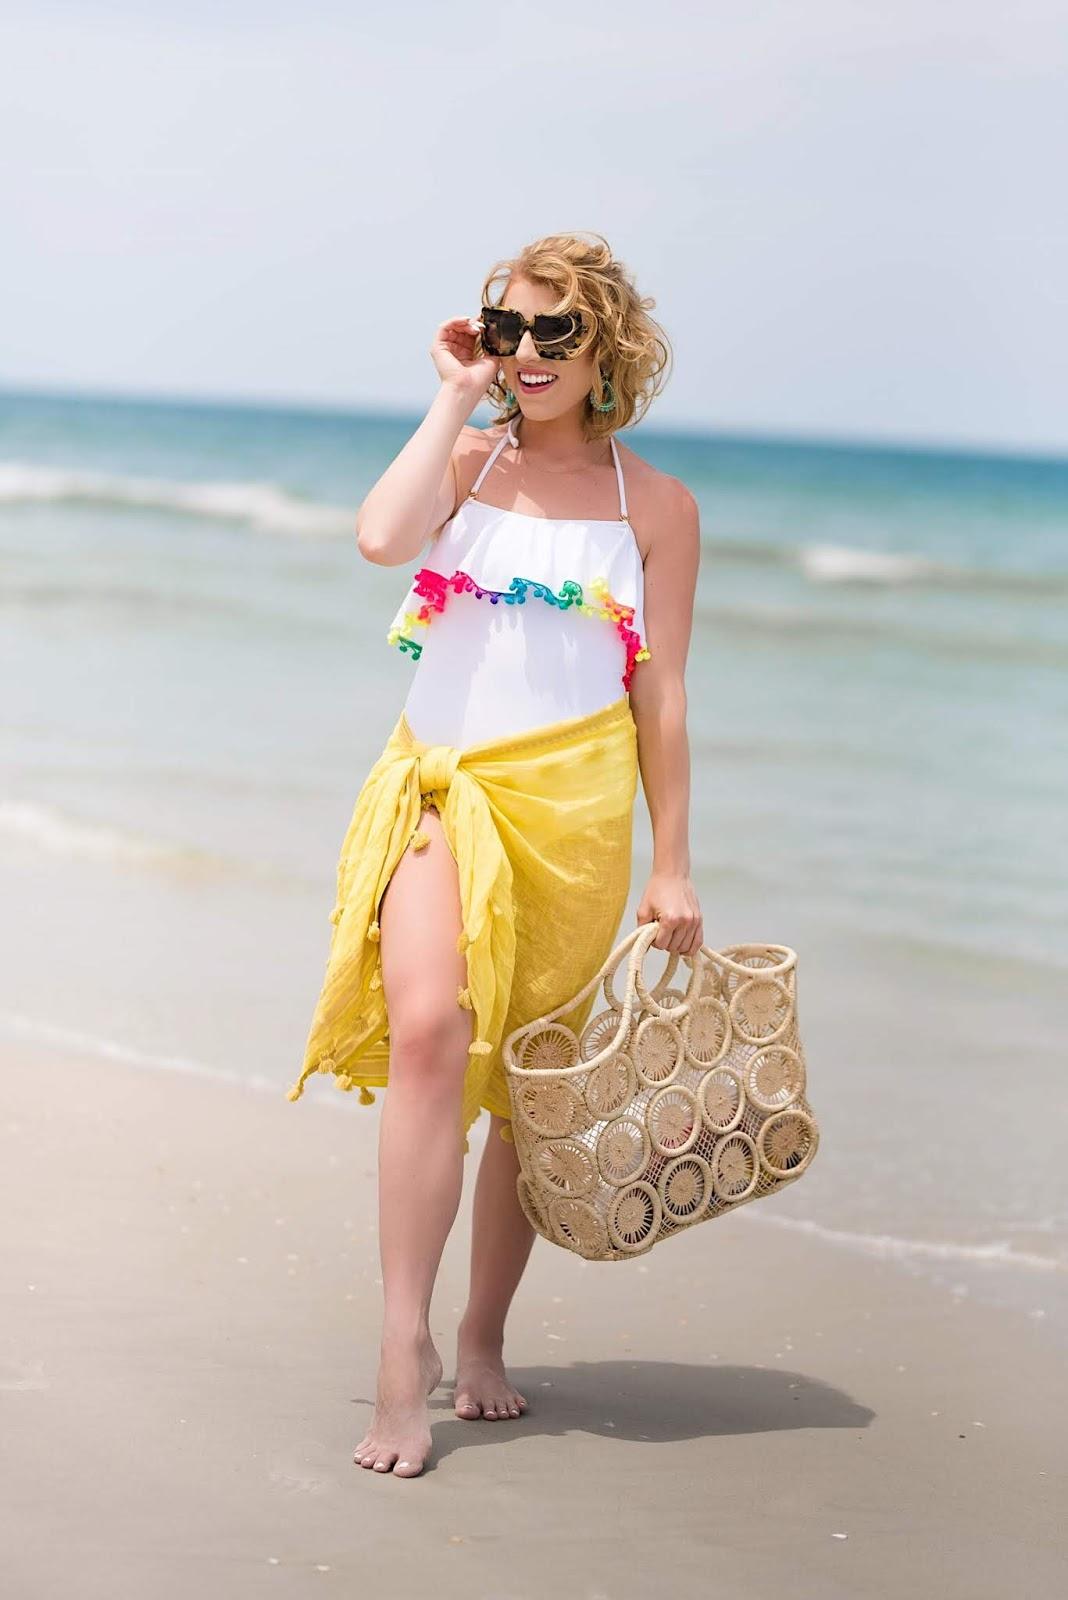 Pilyq Pom Pom Swimsuit - Something Delightful Blog